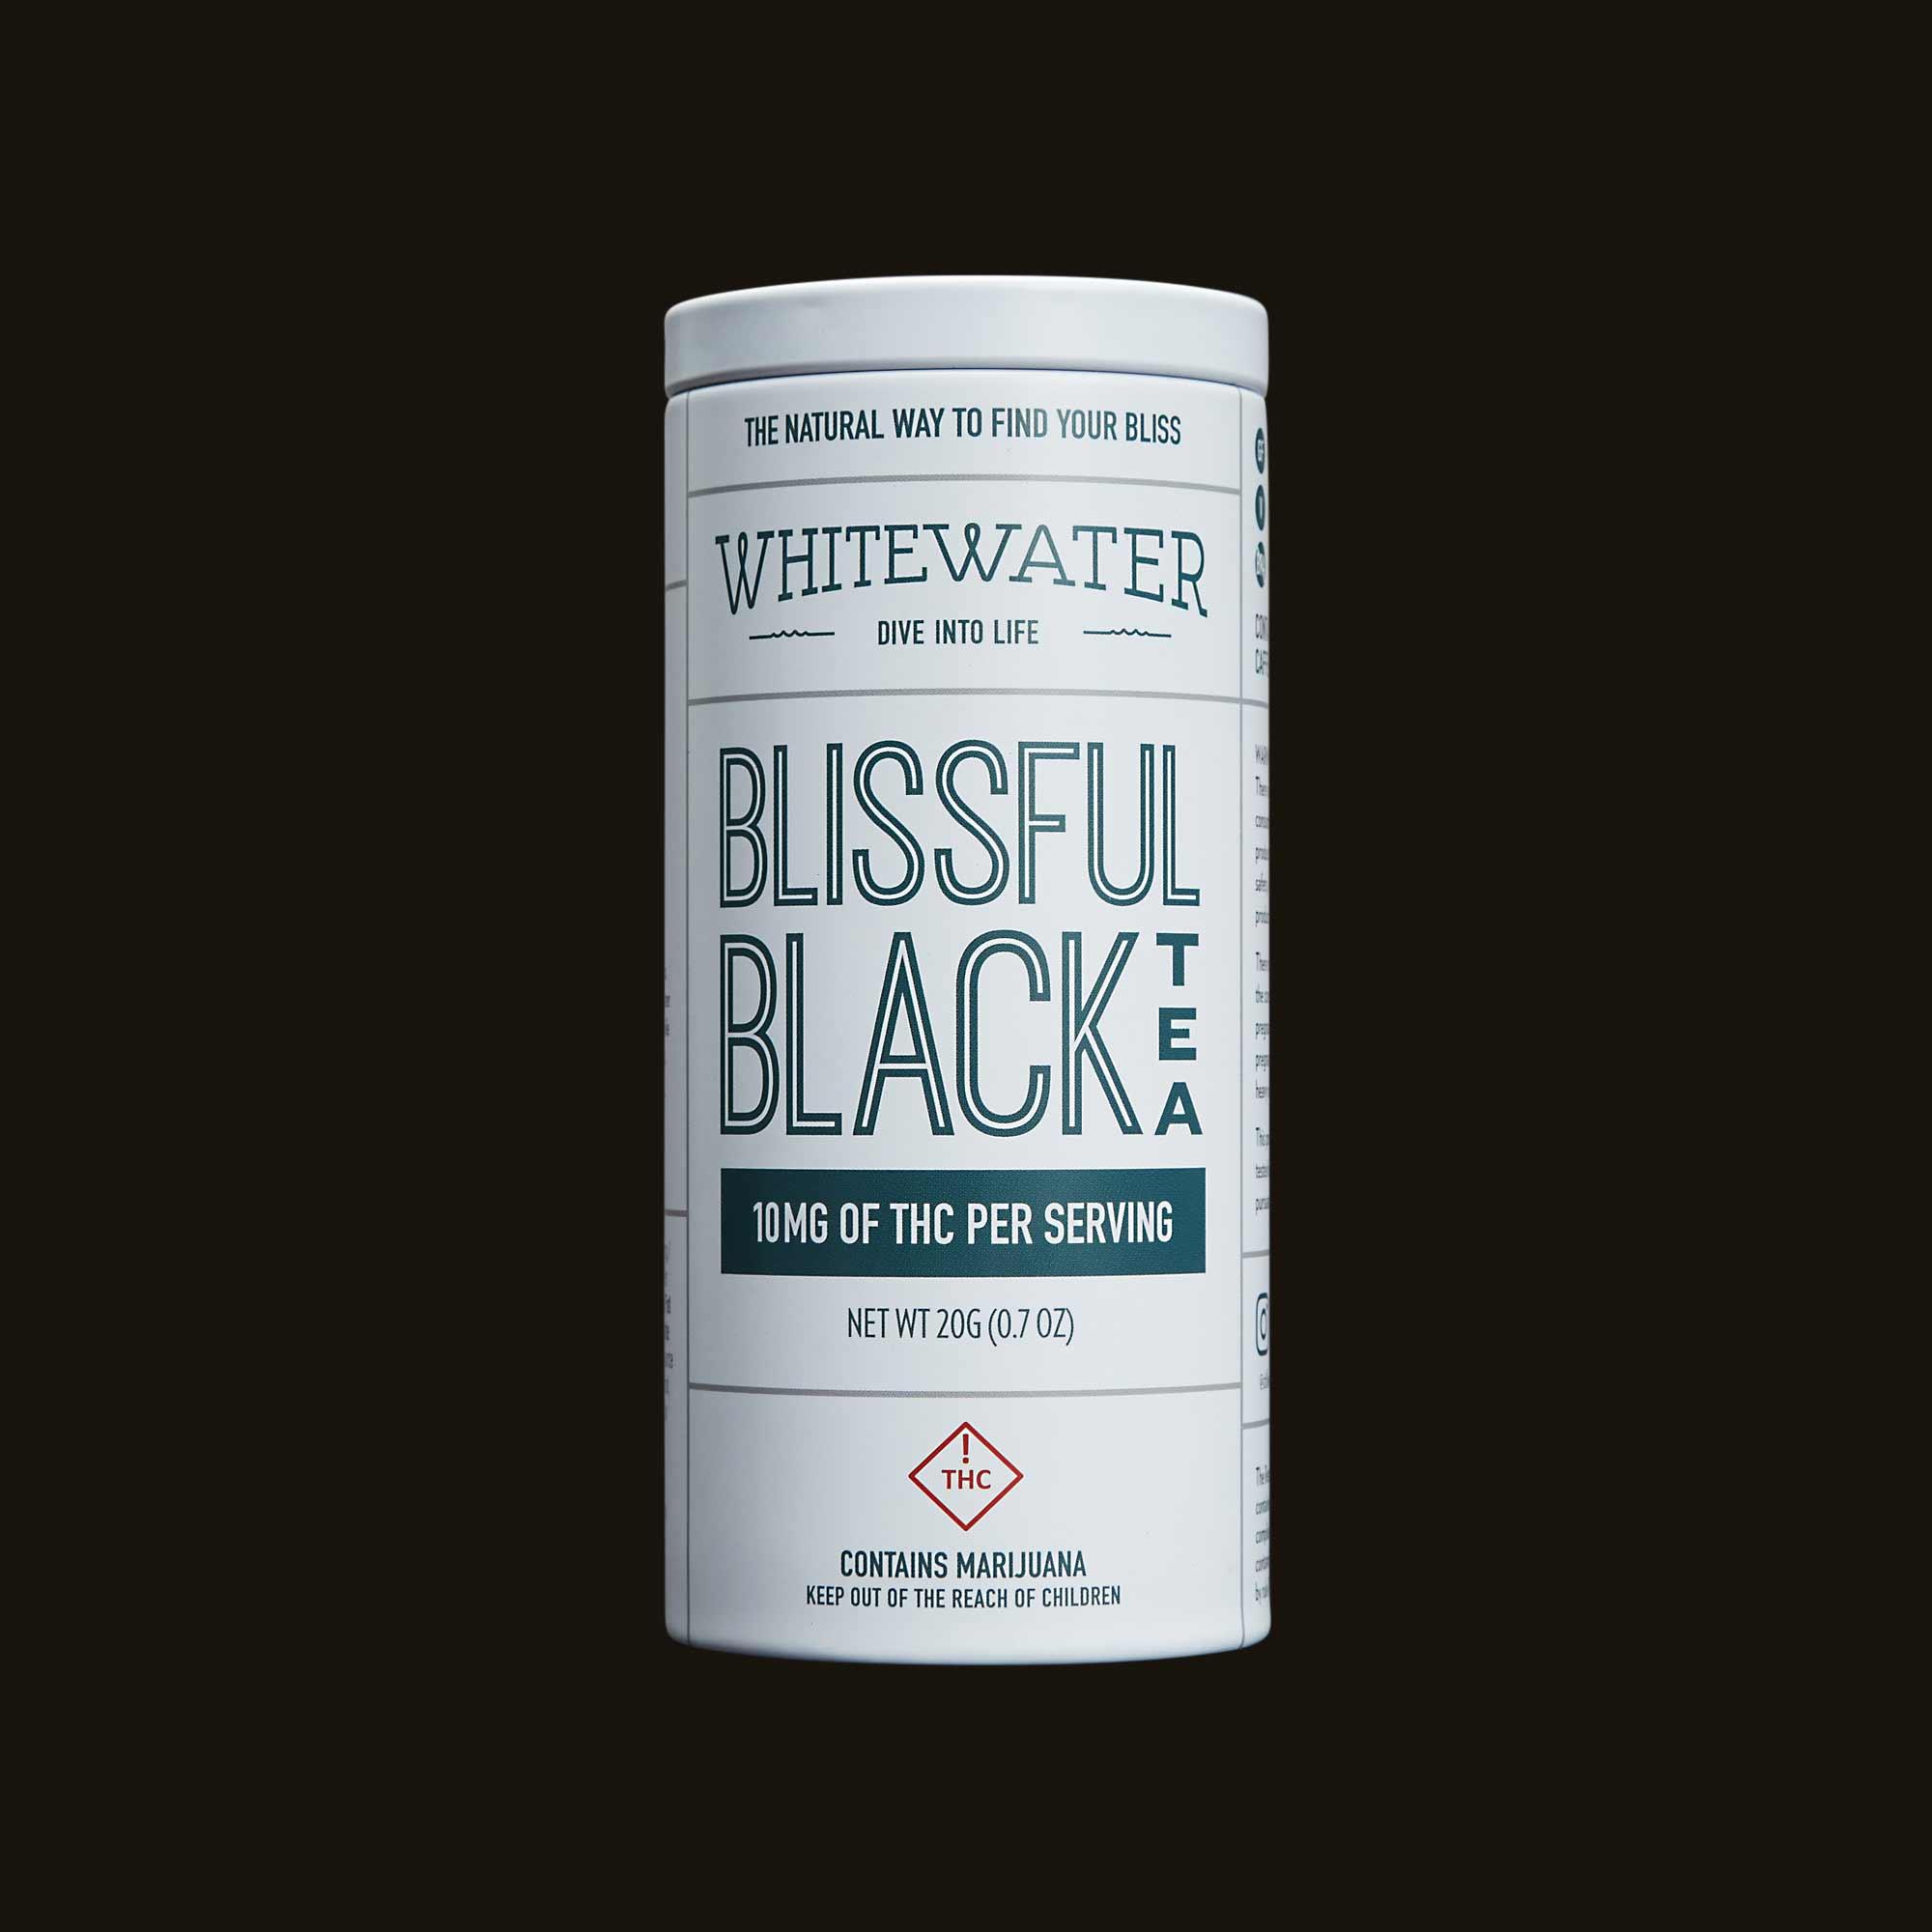 Stillwater Whitewater Blissful Black